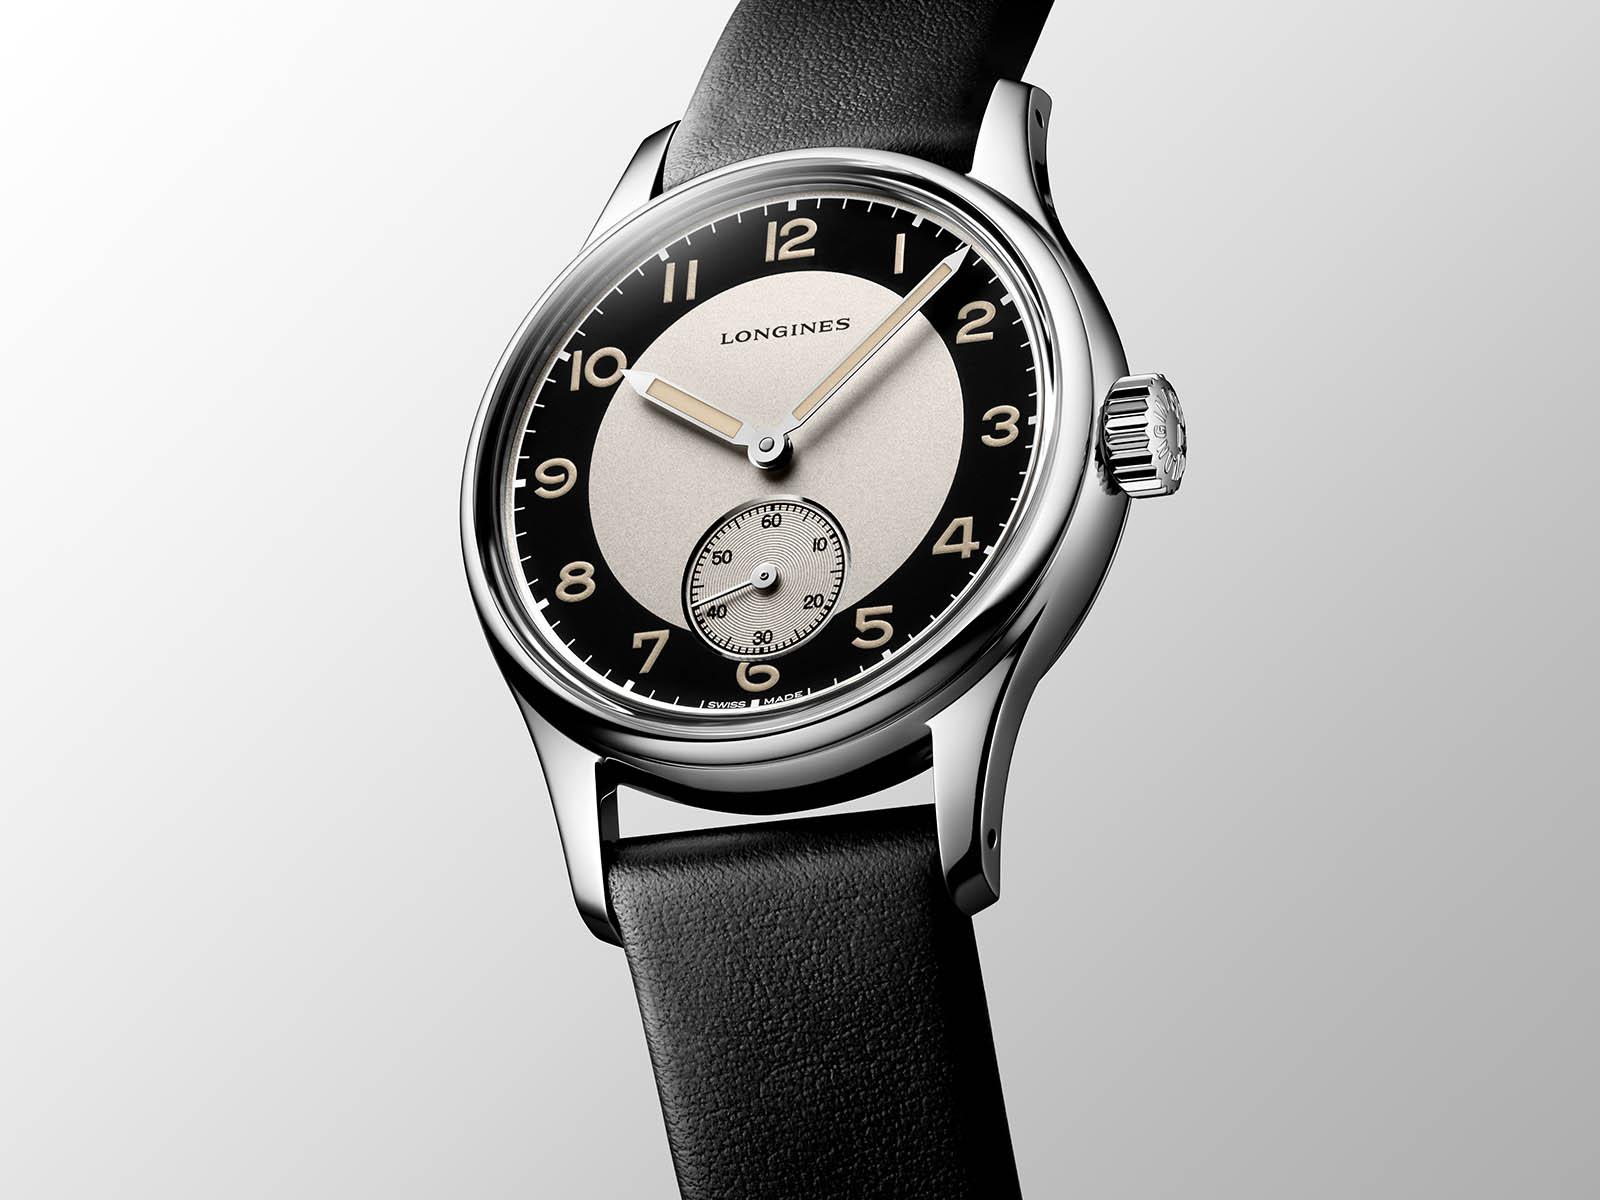 l2-330-4-93-0-longines-heritage-classic-tuxedo-4.jpg